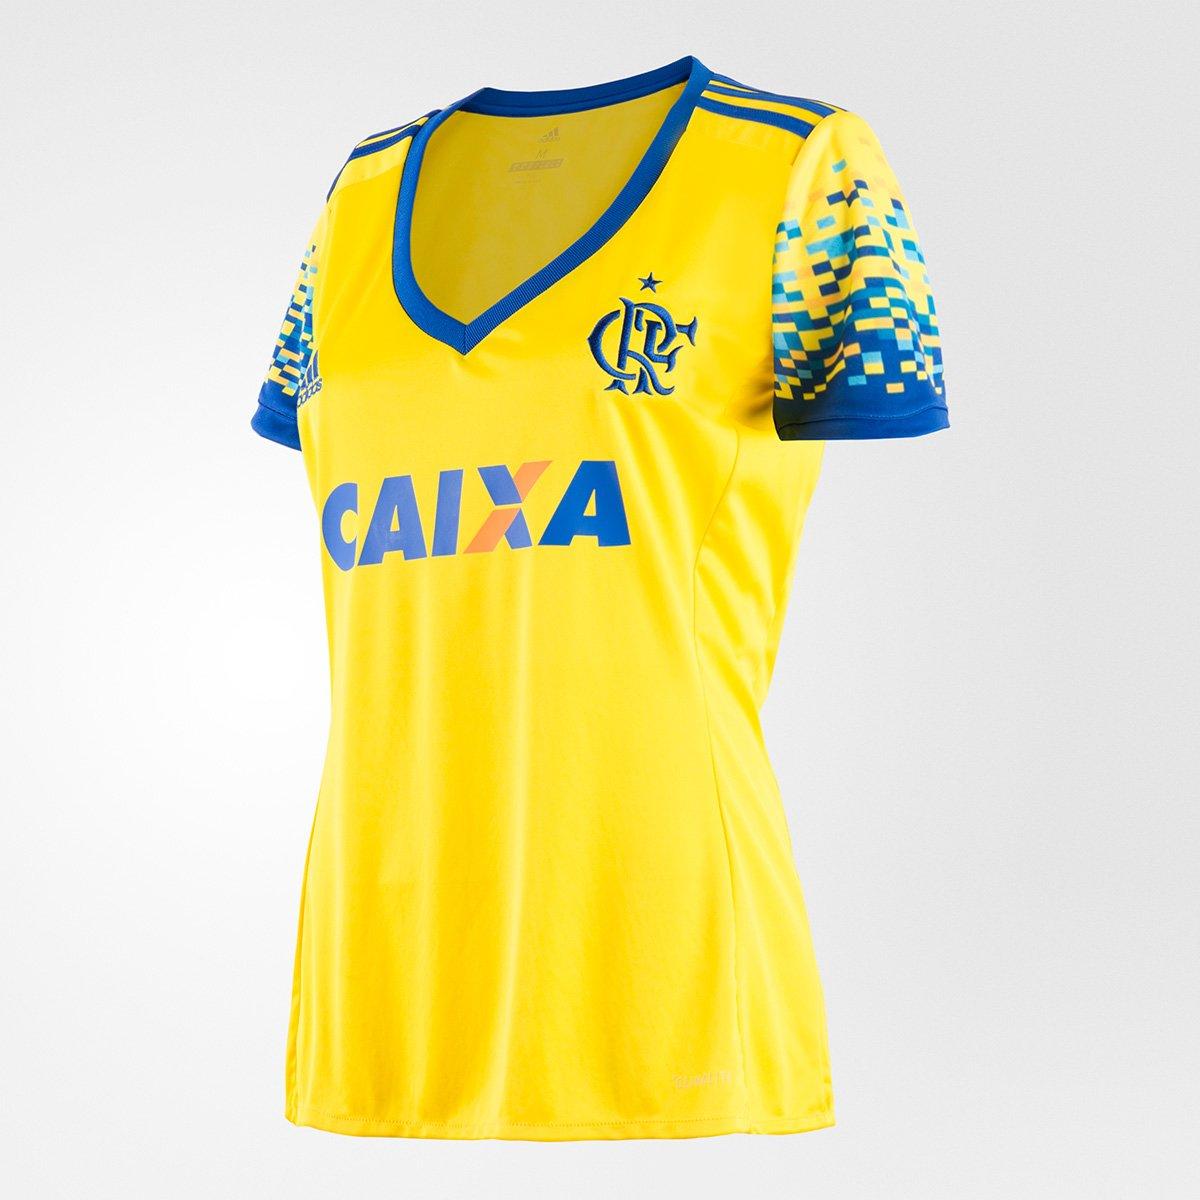 8239548bb6 Camisa Flamengo III 17 18 s nº Torcedor Adidas Feminina - Compre Agora